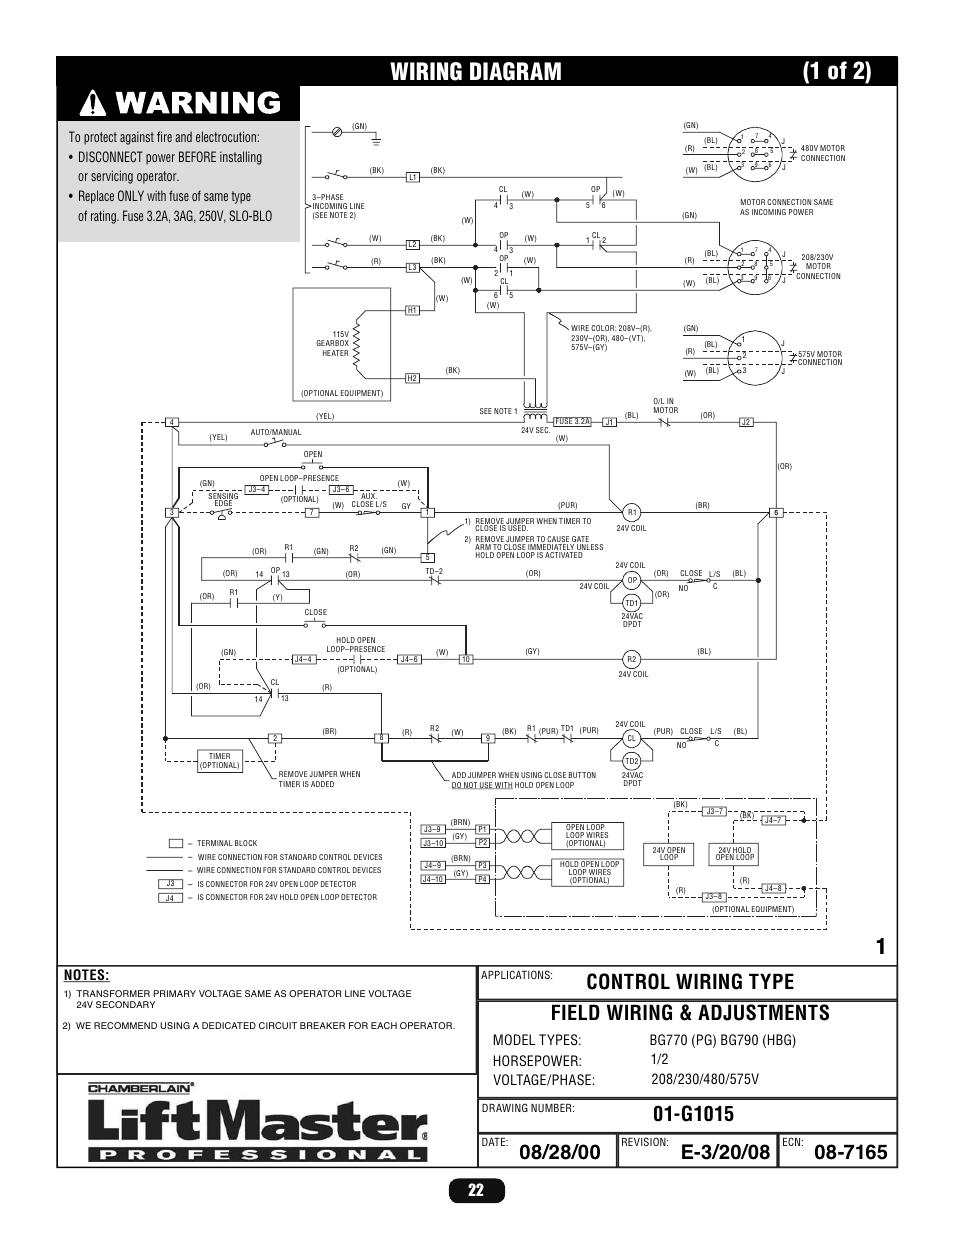 Liftmaster Professional Gate Wiring Diagram - WIRING DIAGRAMS • on lift pump diagram, lift parts diagram, lift accessories, lift motor diagram, lift switch diagram,